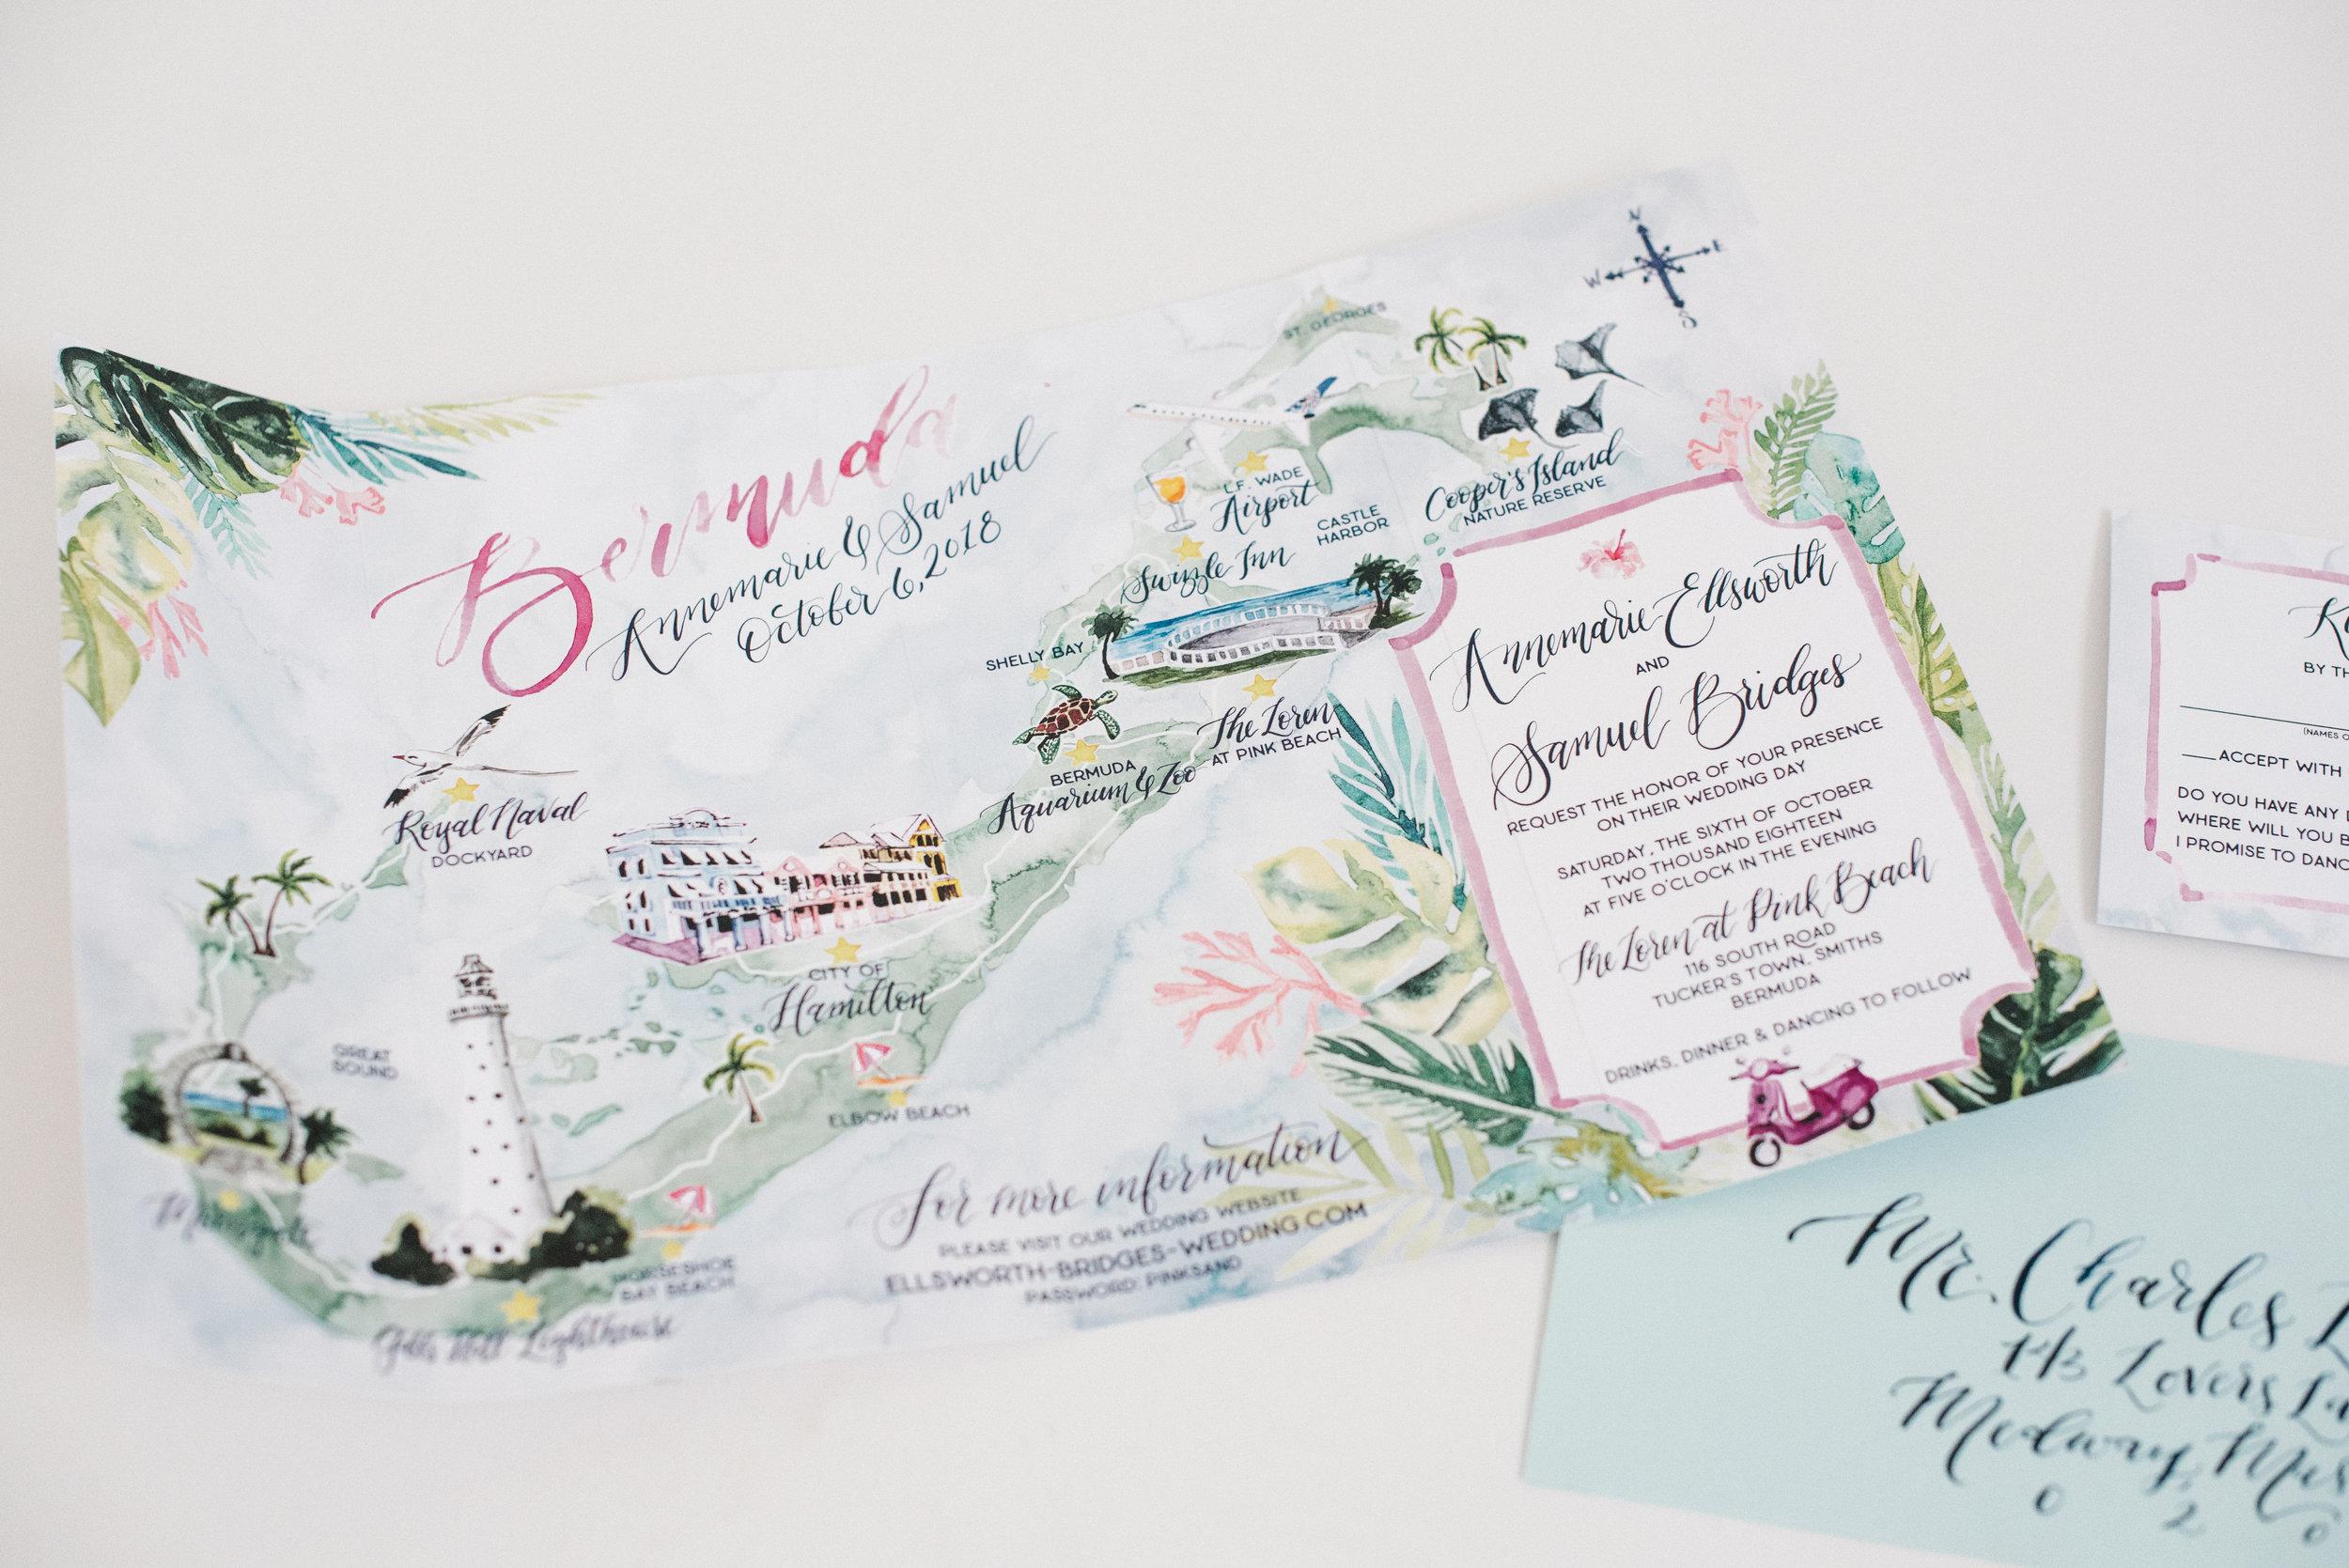 LARGE BERMUDA MAP WATERCOLOR WEDDING INVITATION